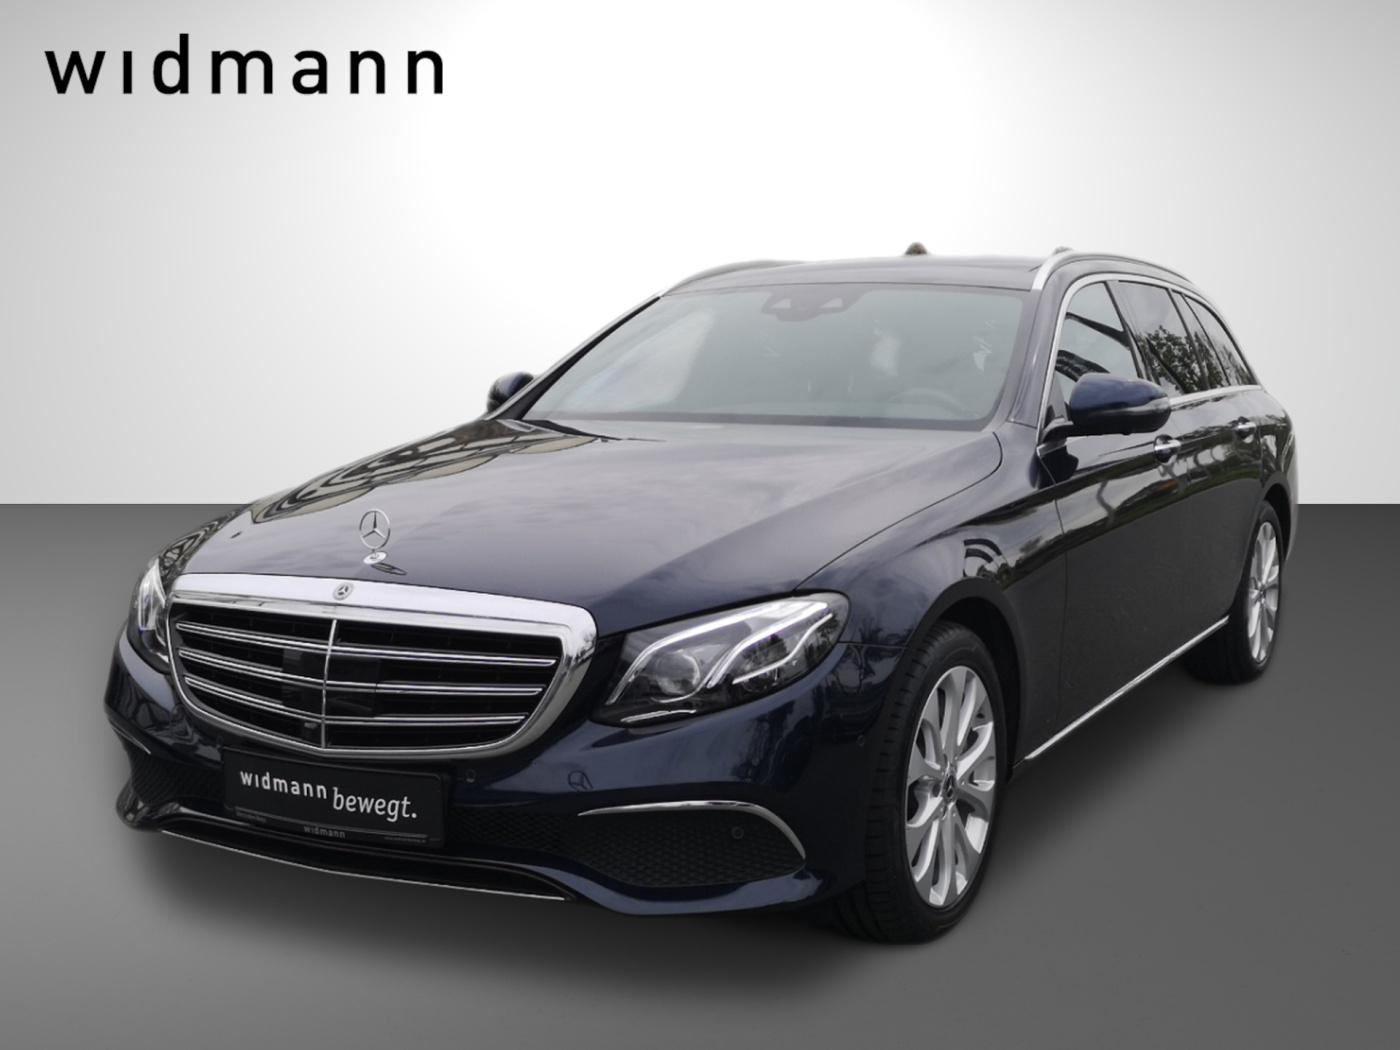 Mercedes-Benz E 400 4M T *Avantgarde*Comand*Multibeam*Standhzg, Jahr 2017, Benzin